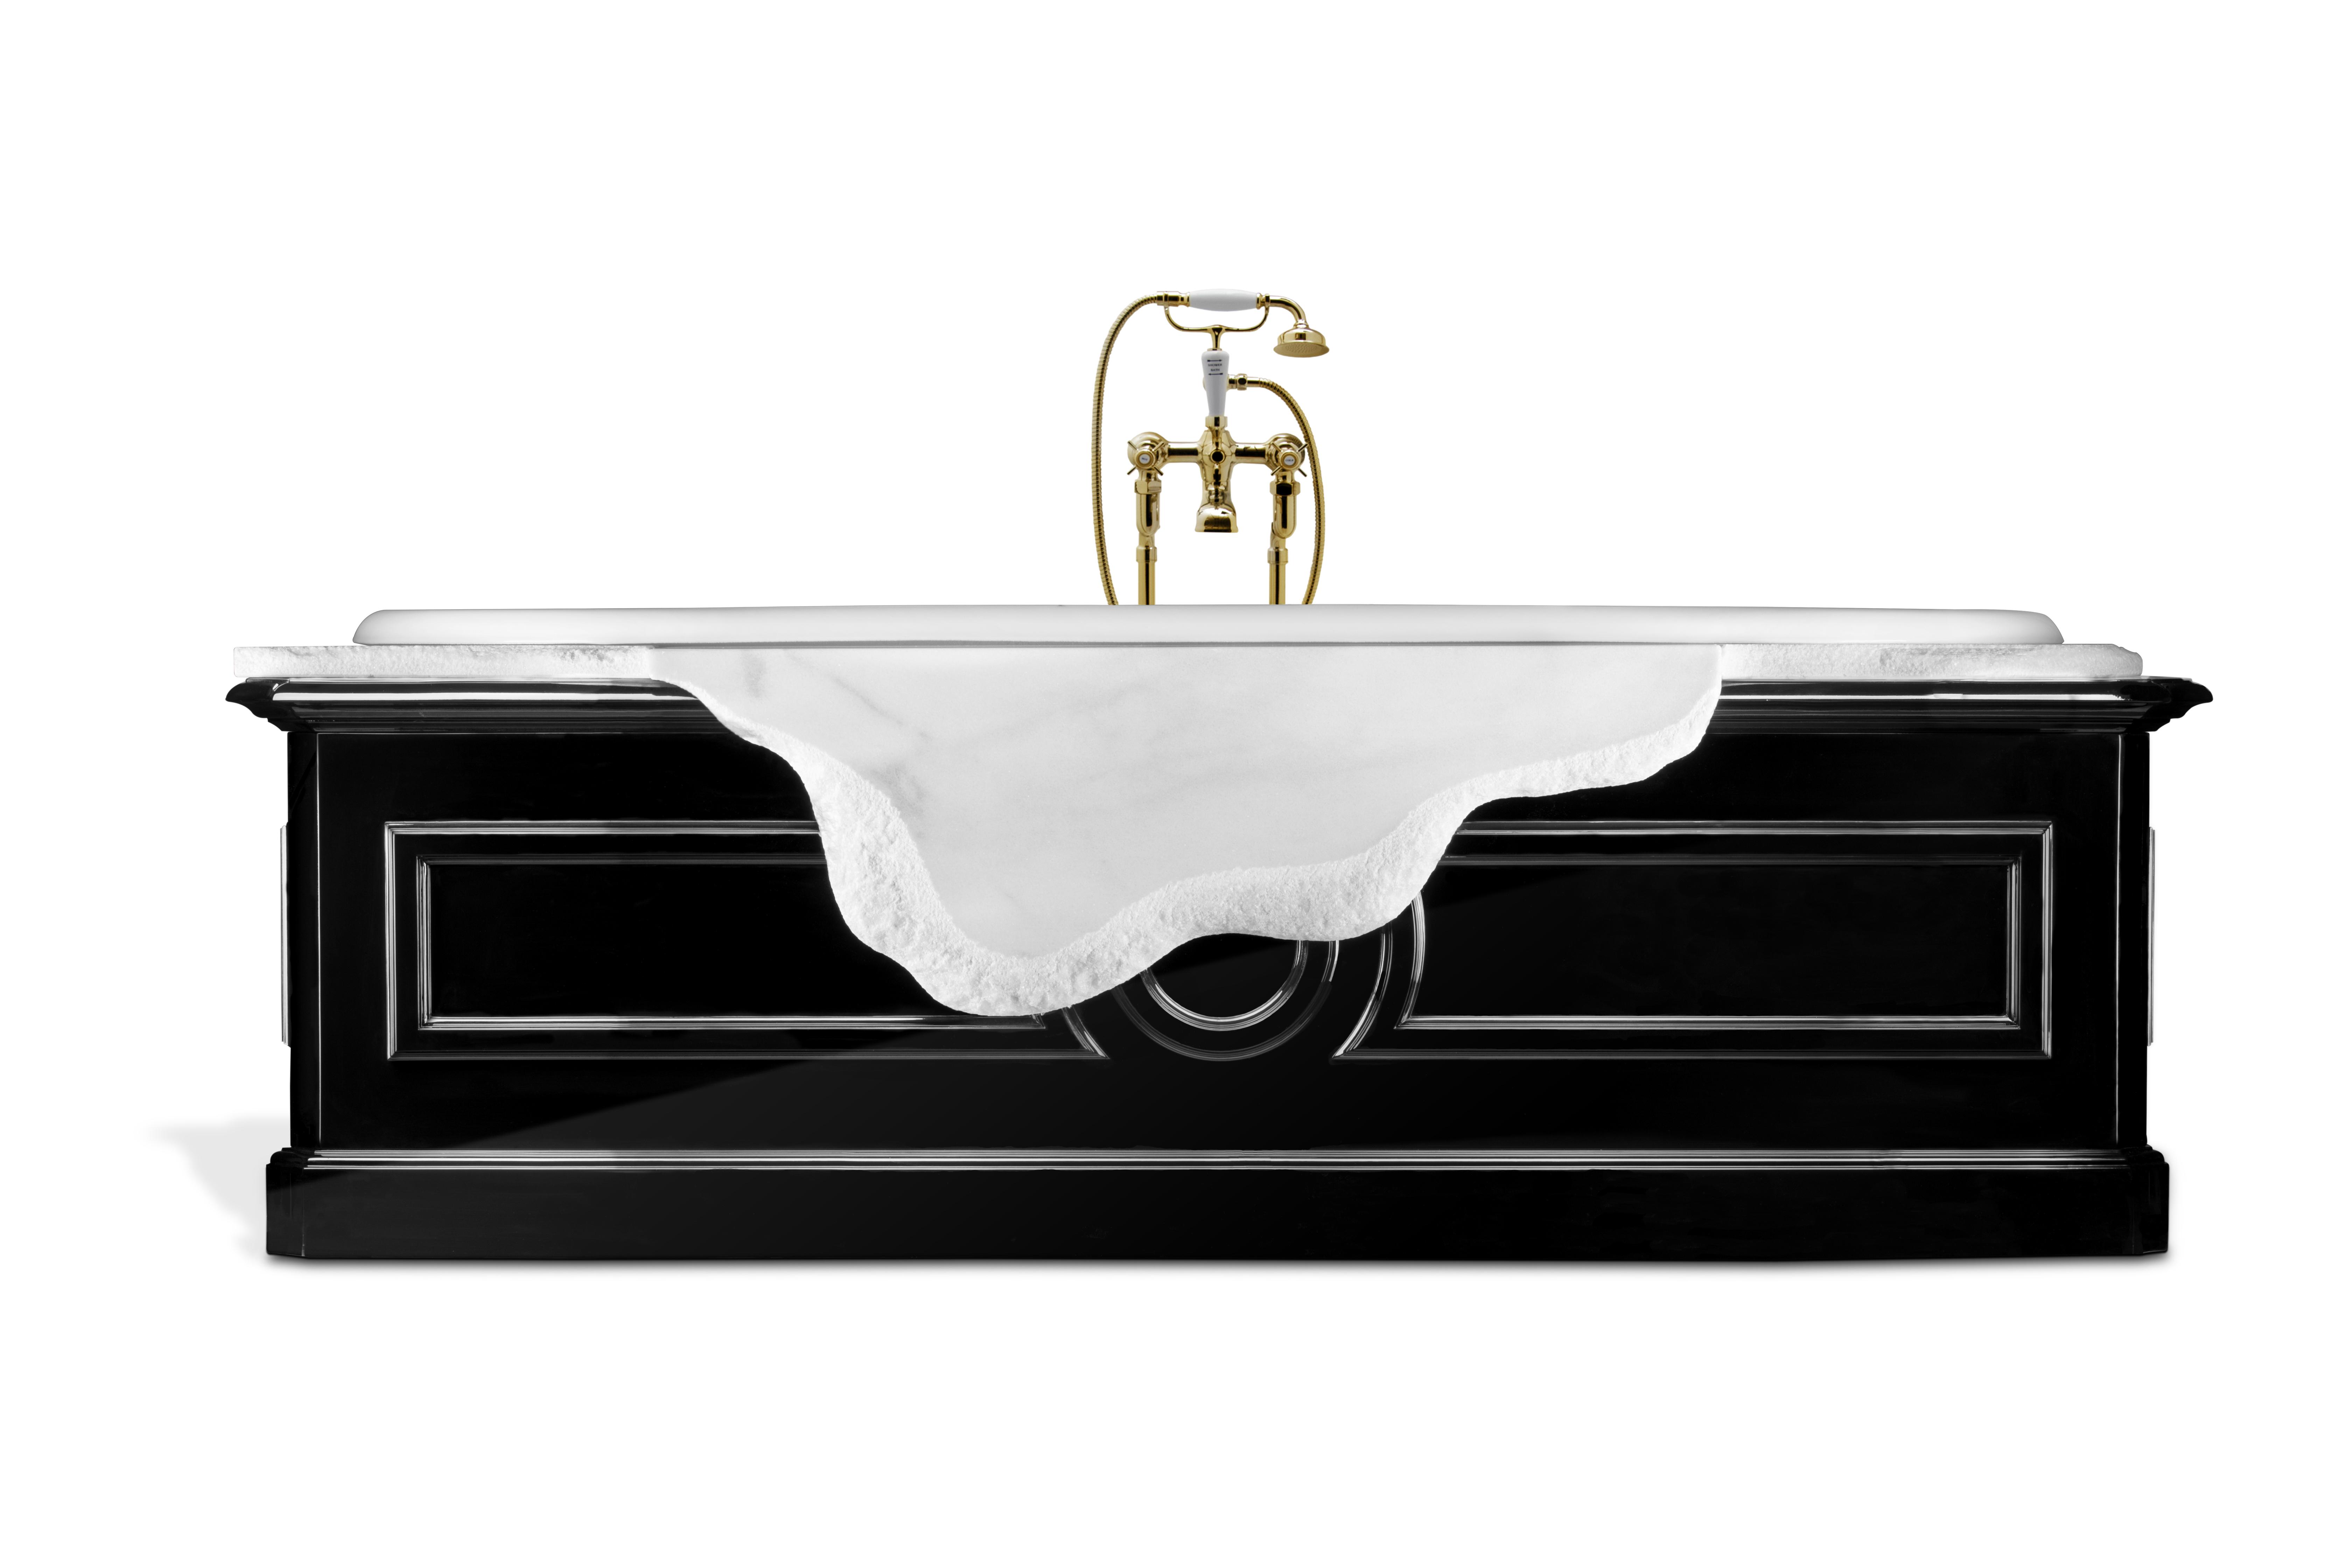 Shake up your bathroom with Maison Valentina´s luxurious bathtubs luxurious bathtubs Shake up your bathroom with Maison Valentina´s luxurious bathtubs petra bathtub 1